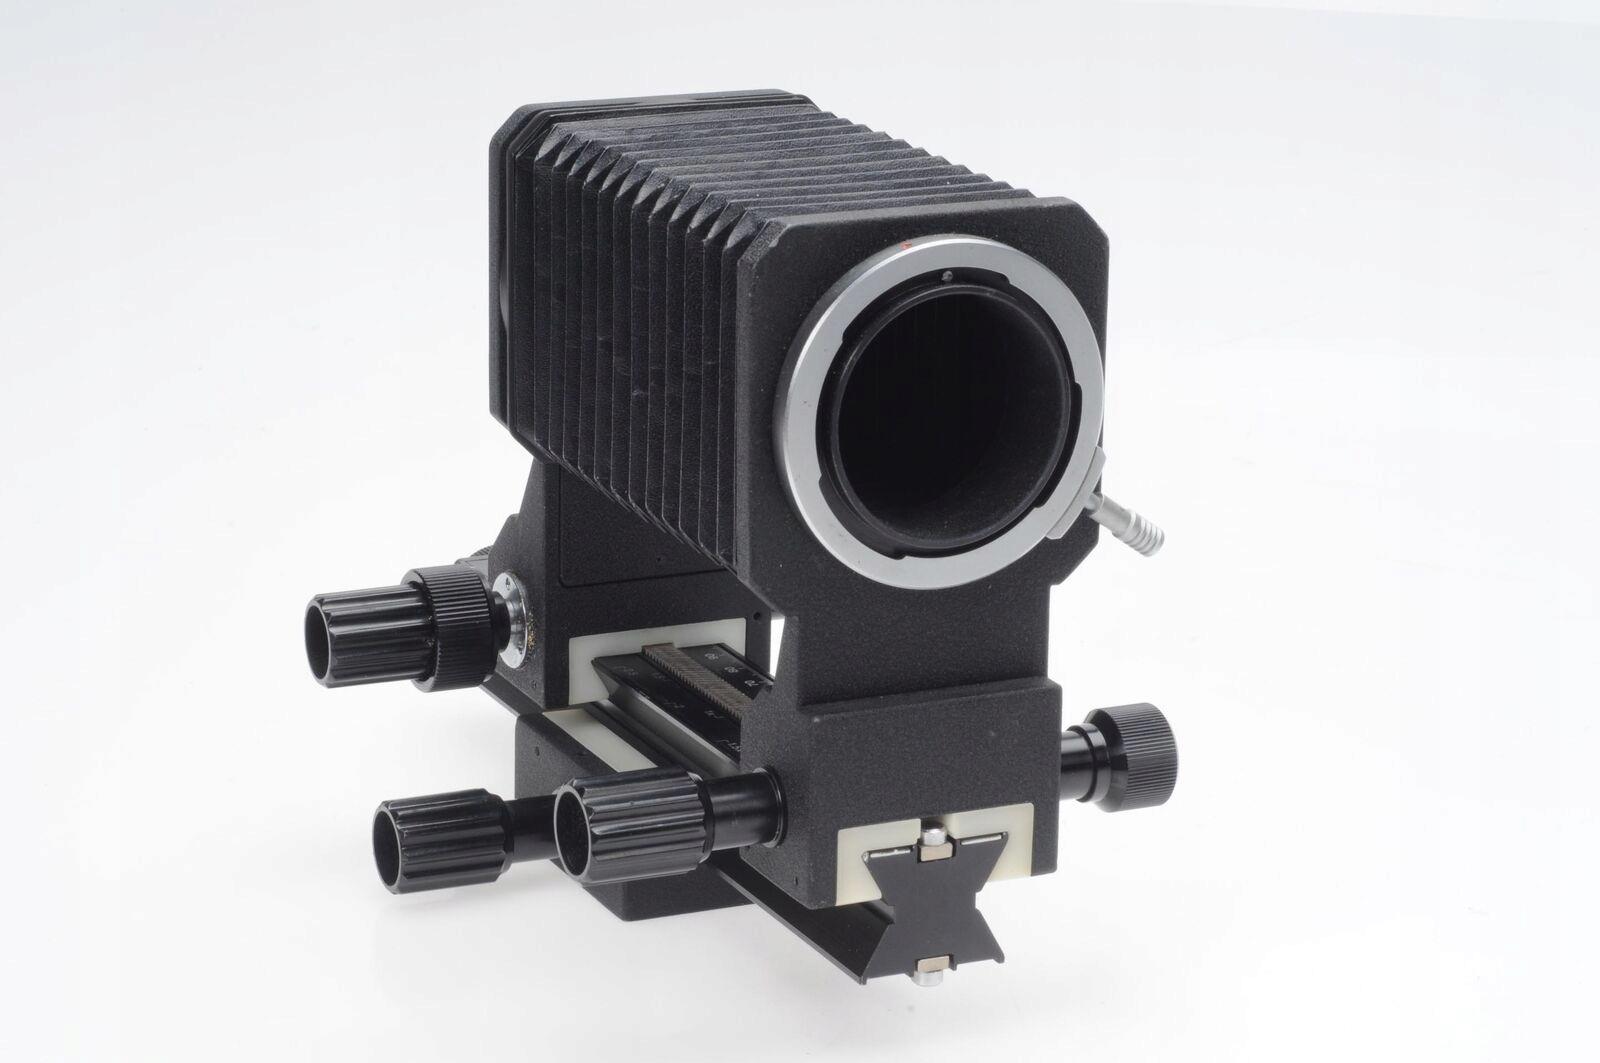 mieszek makro Canon FD Auto Bellows